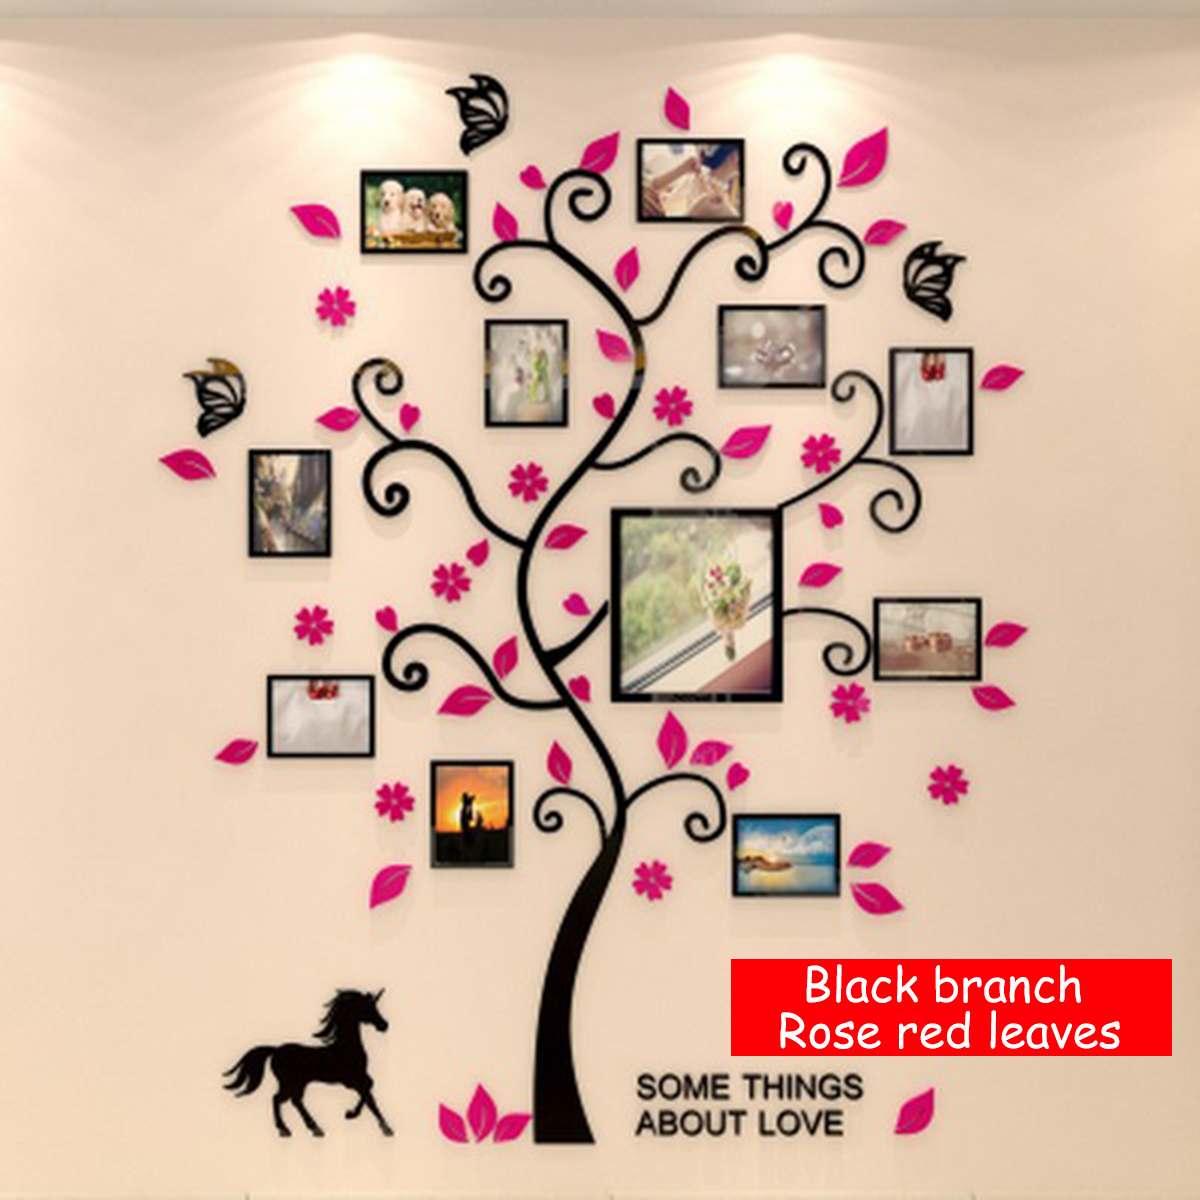 3D Wand Aufkleber Familie Foto Rahmen Baum Abnehmbare Acryl Fotoalbum Wand Decals Kunst Wohnzimmer Schlafzimmer Wohnkultur